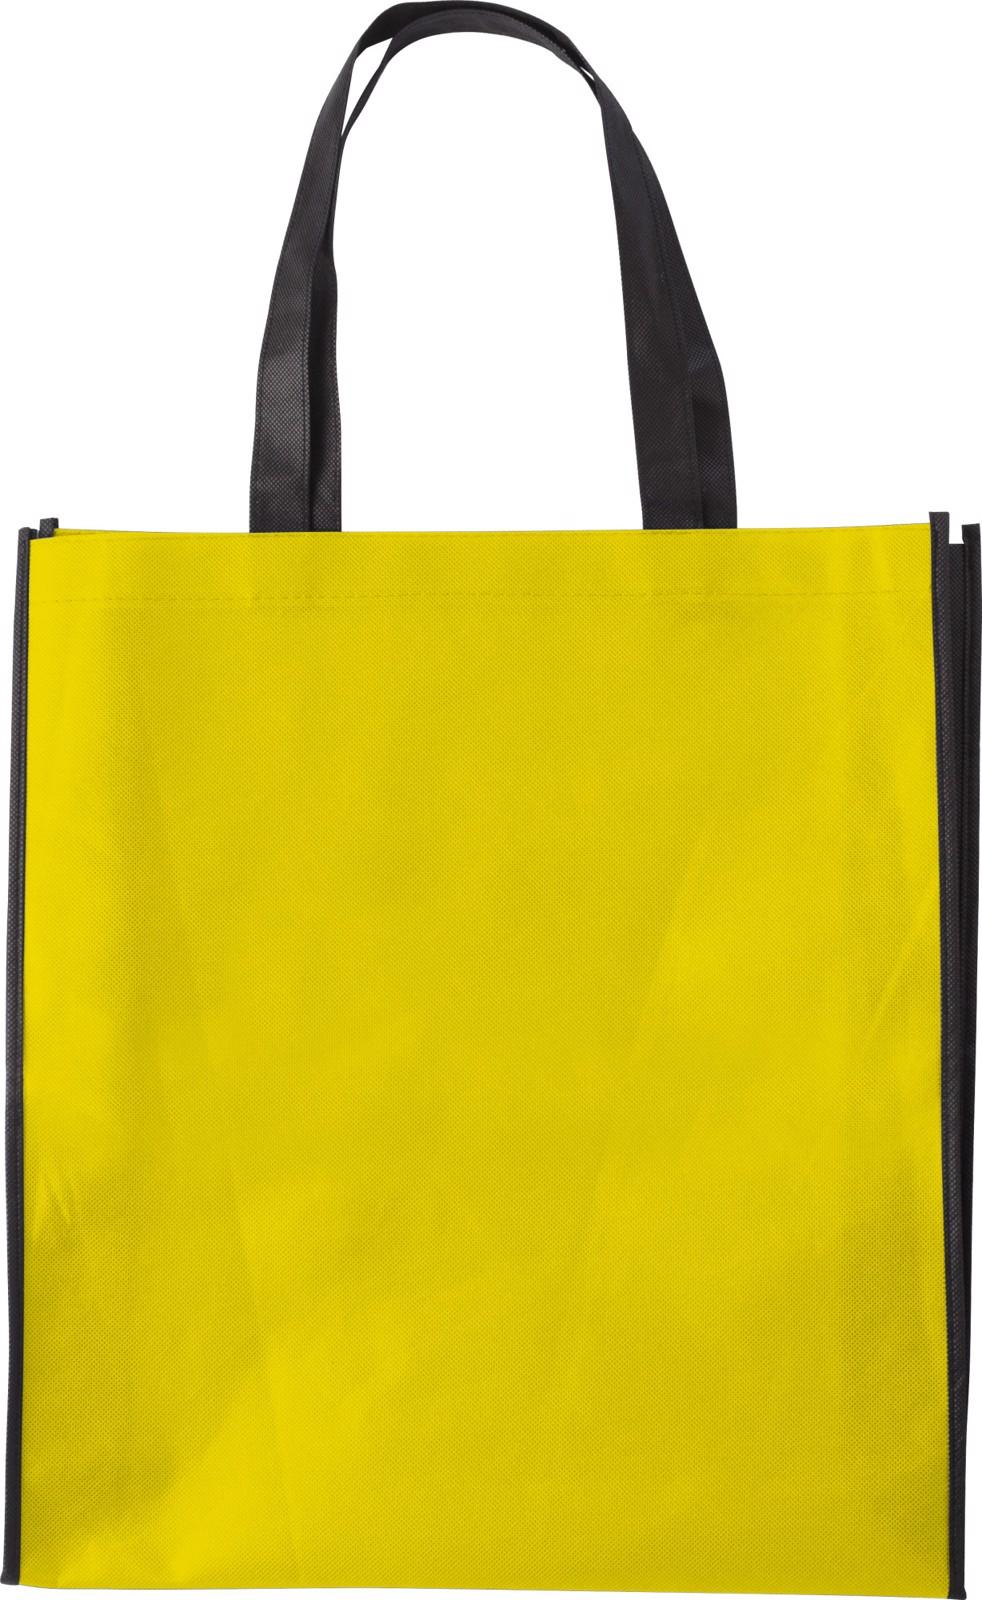 Nonwoven (80 gr/m²) shopping bag - Yellow